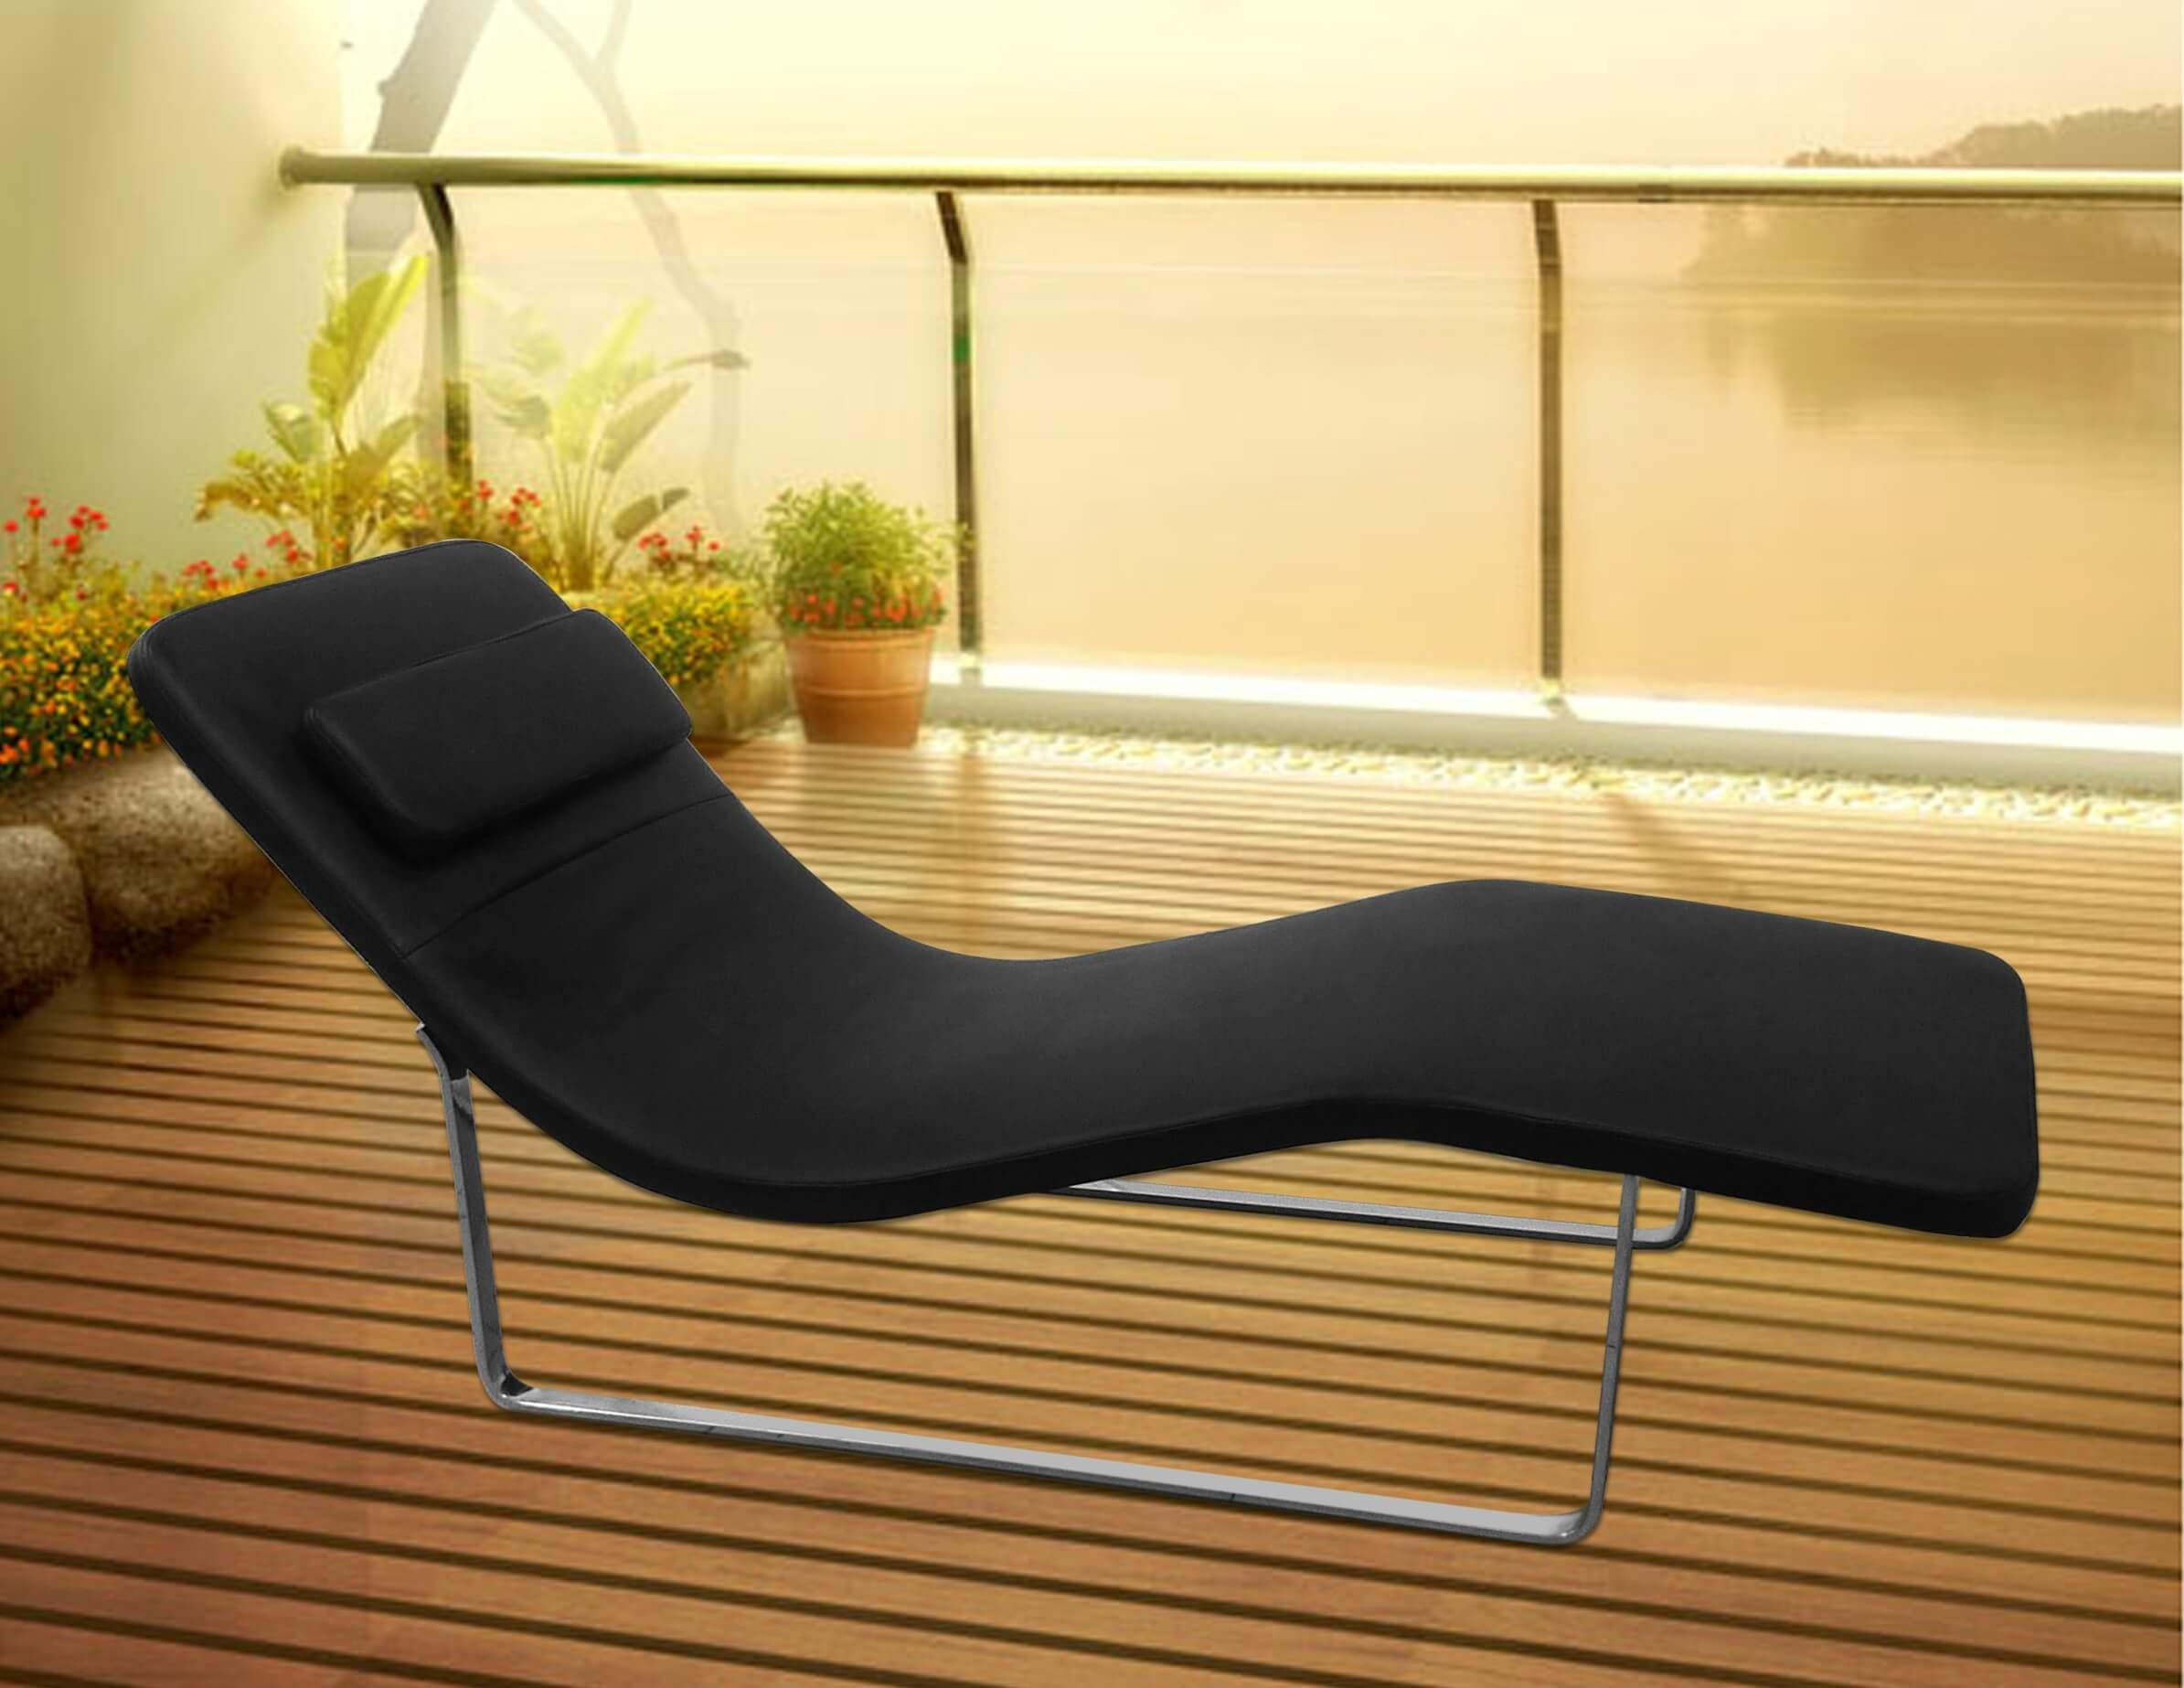 Longa Chaise Lounge